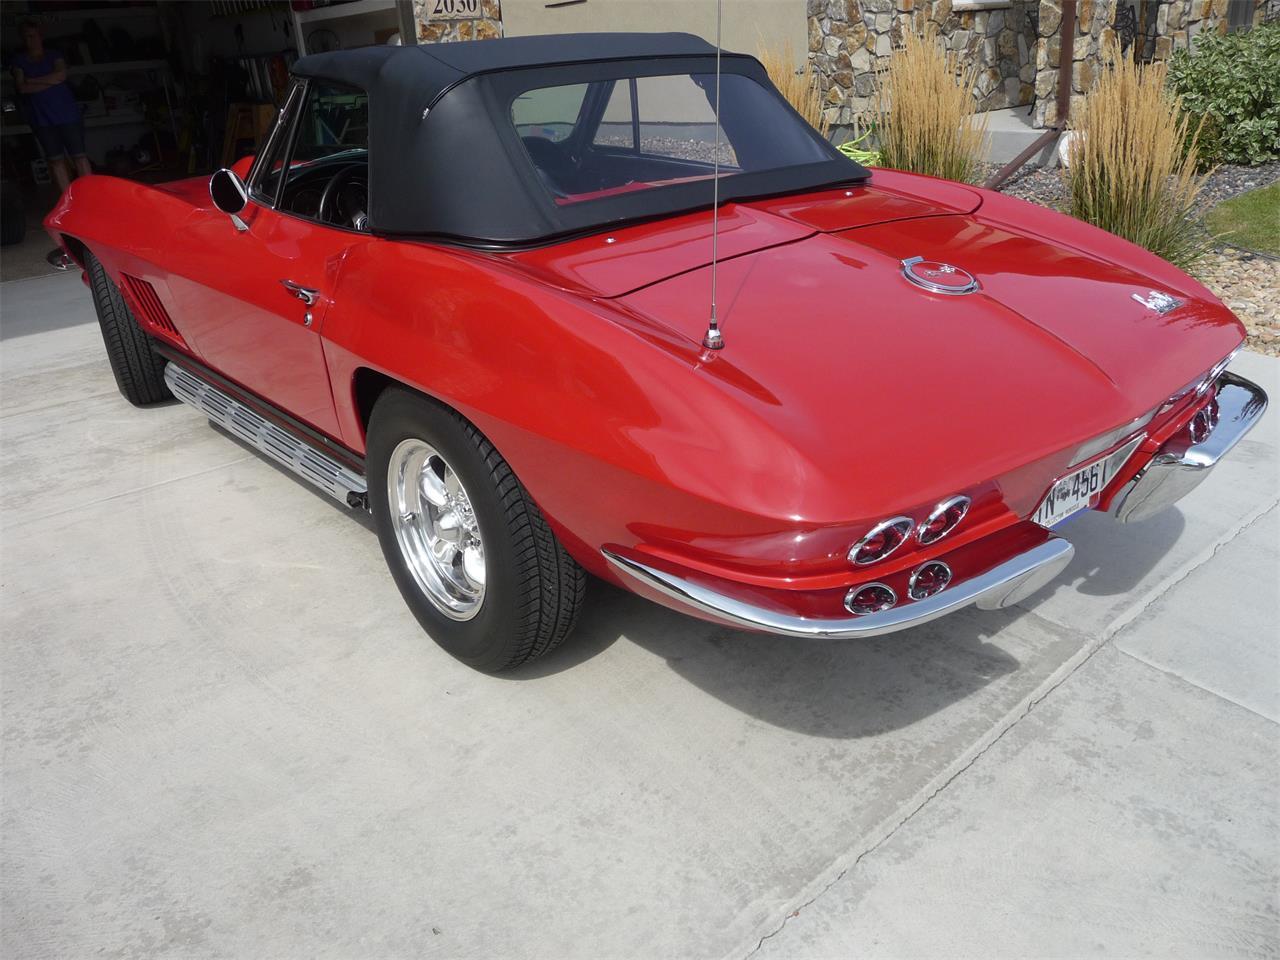 Large Picture of '67 Corvette located in Colorado - $55,000.00 - OJOQ